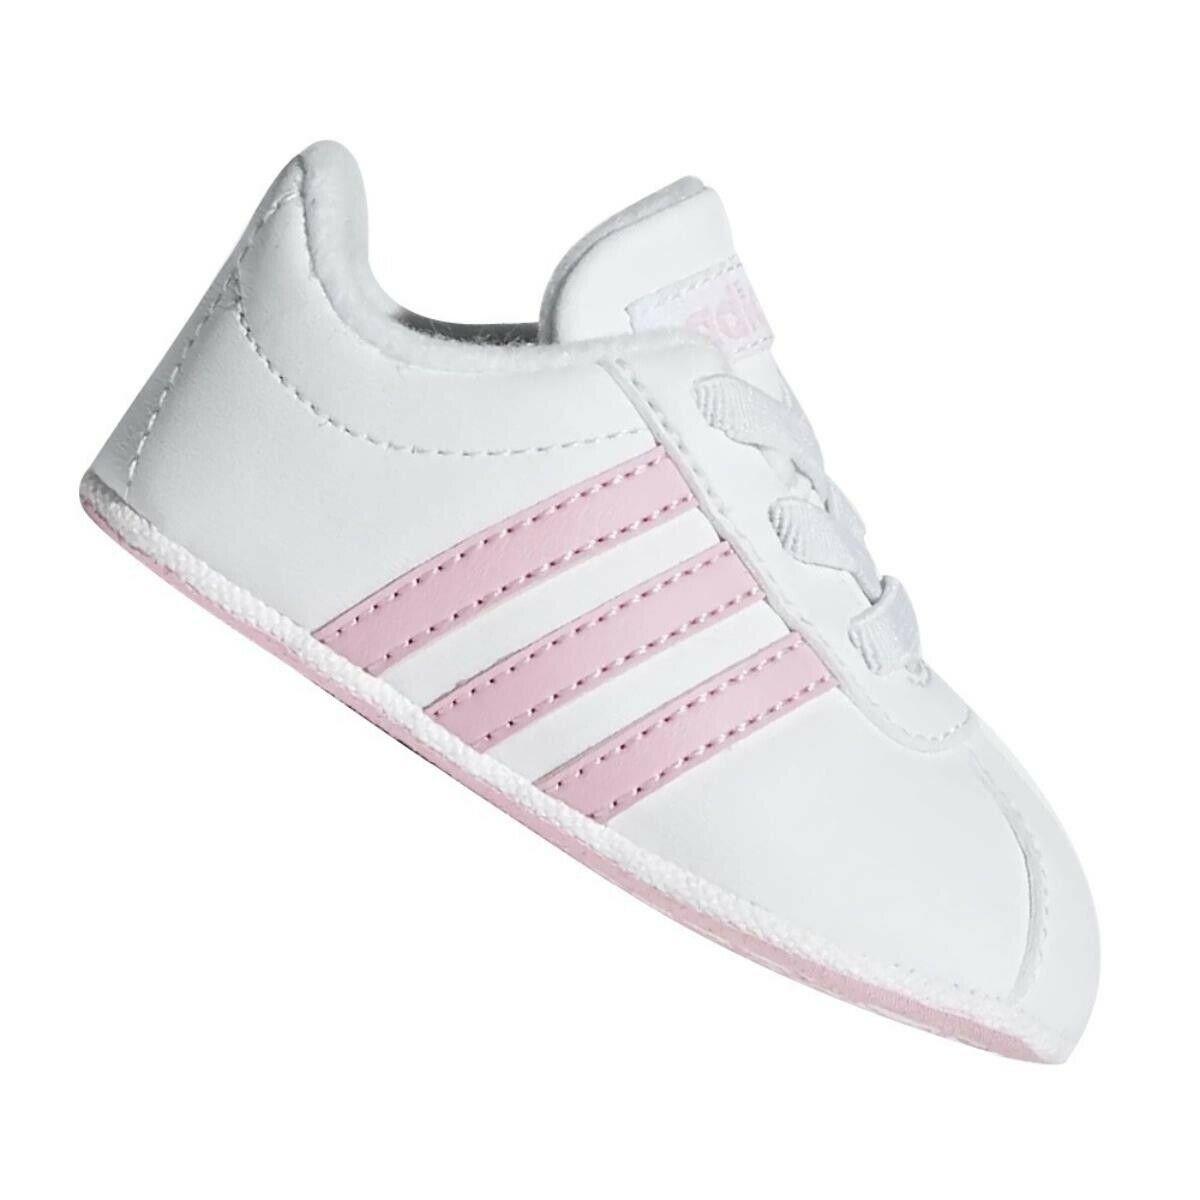 Adidas VL COURT 2.0 CRIB